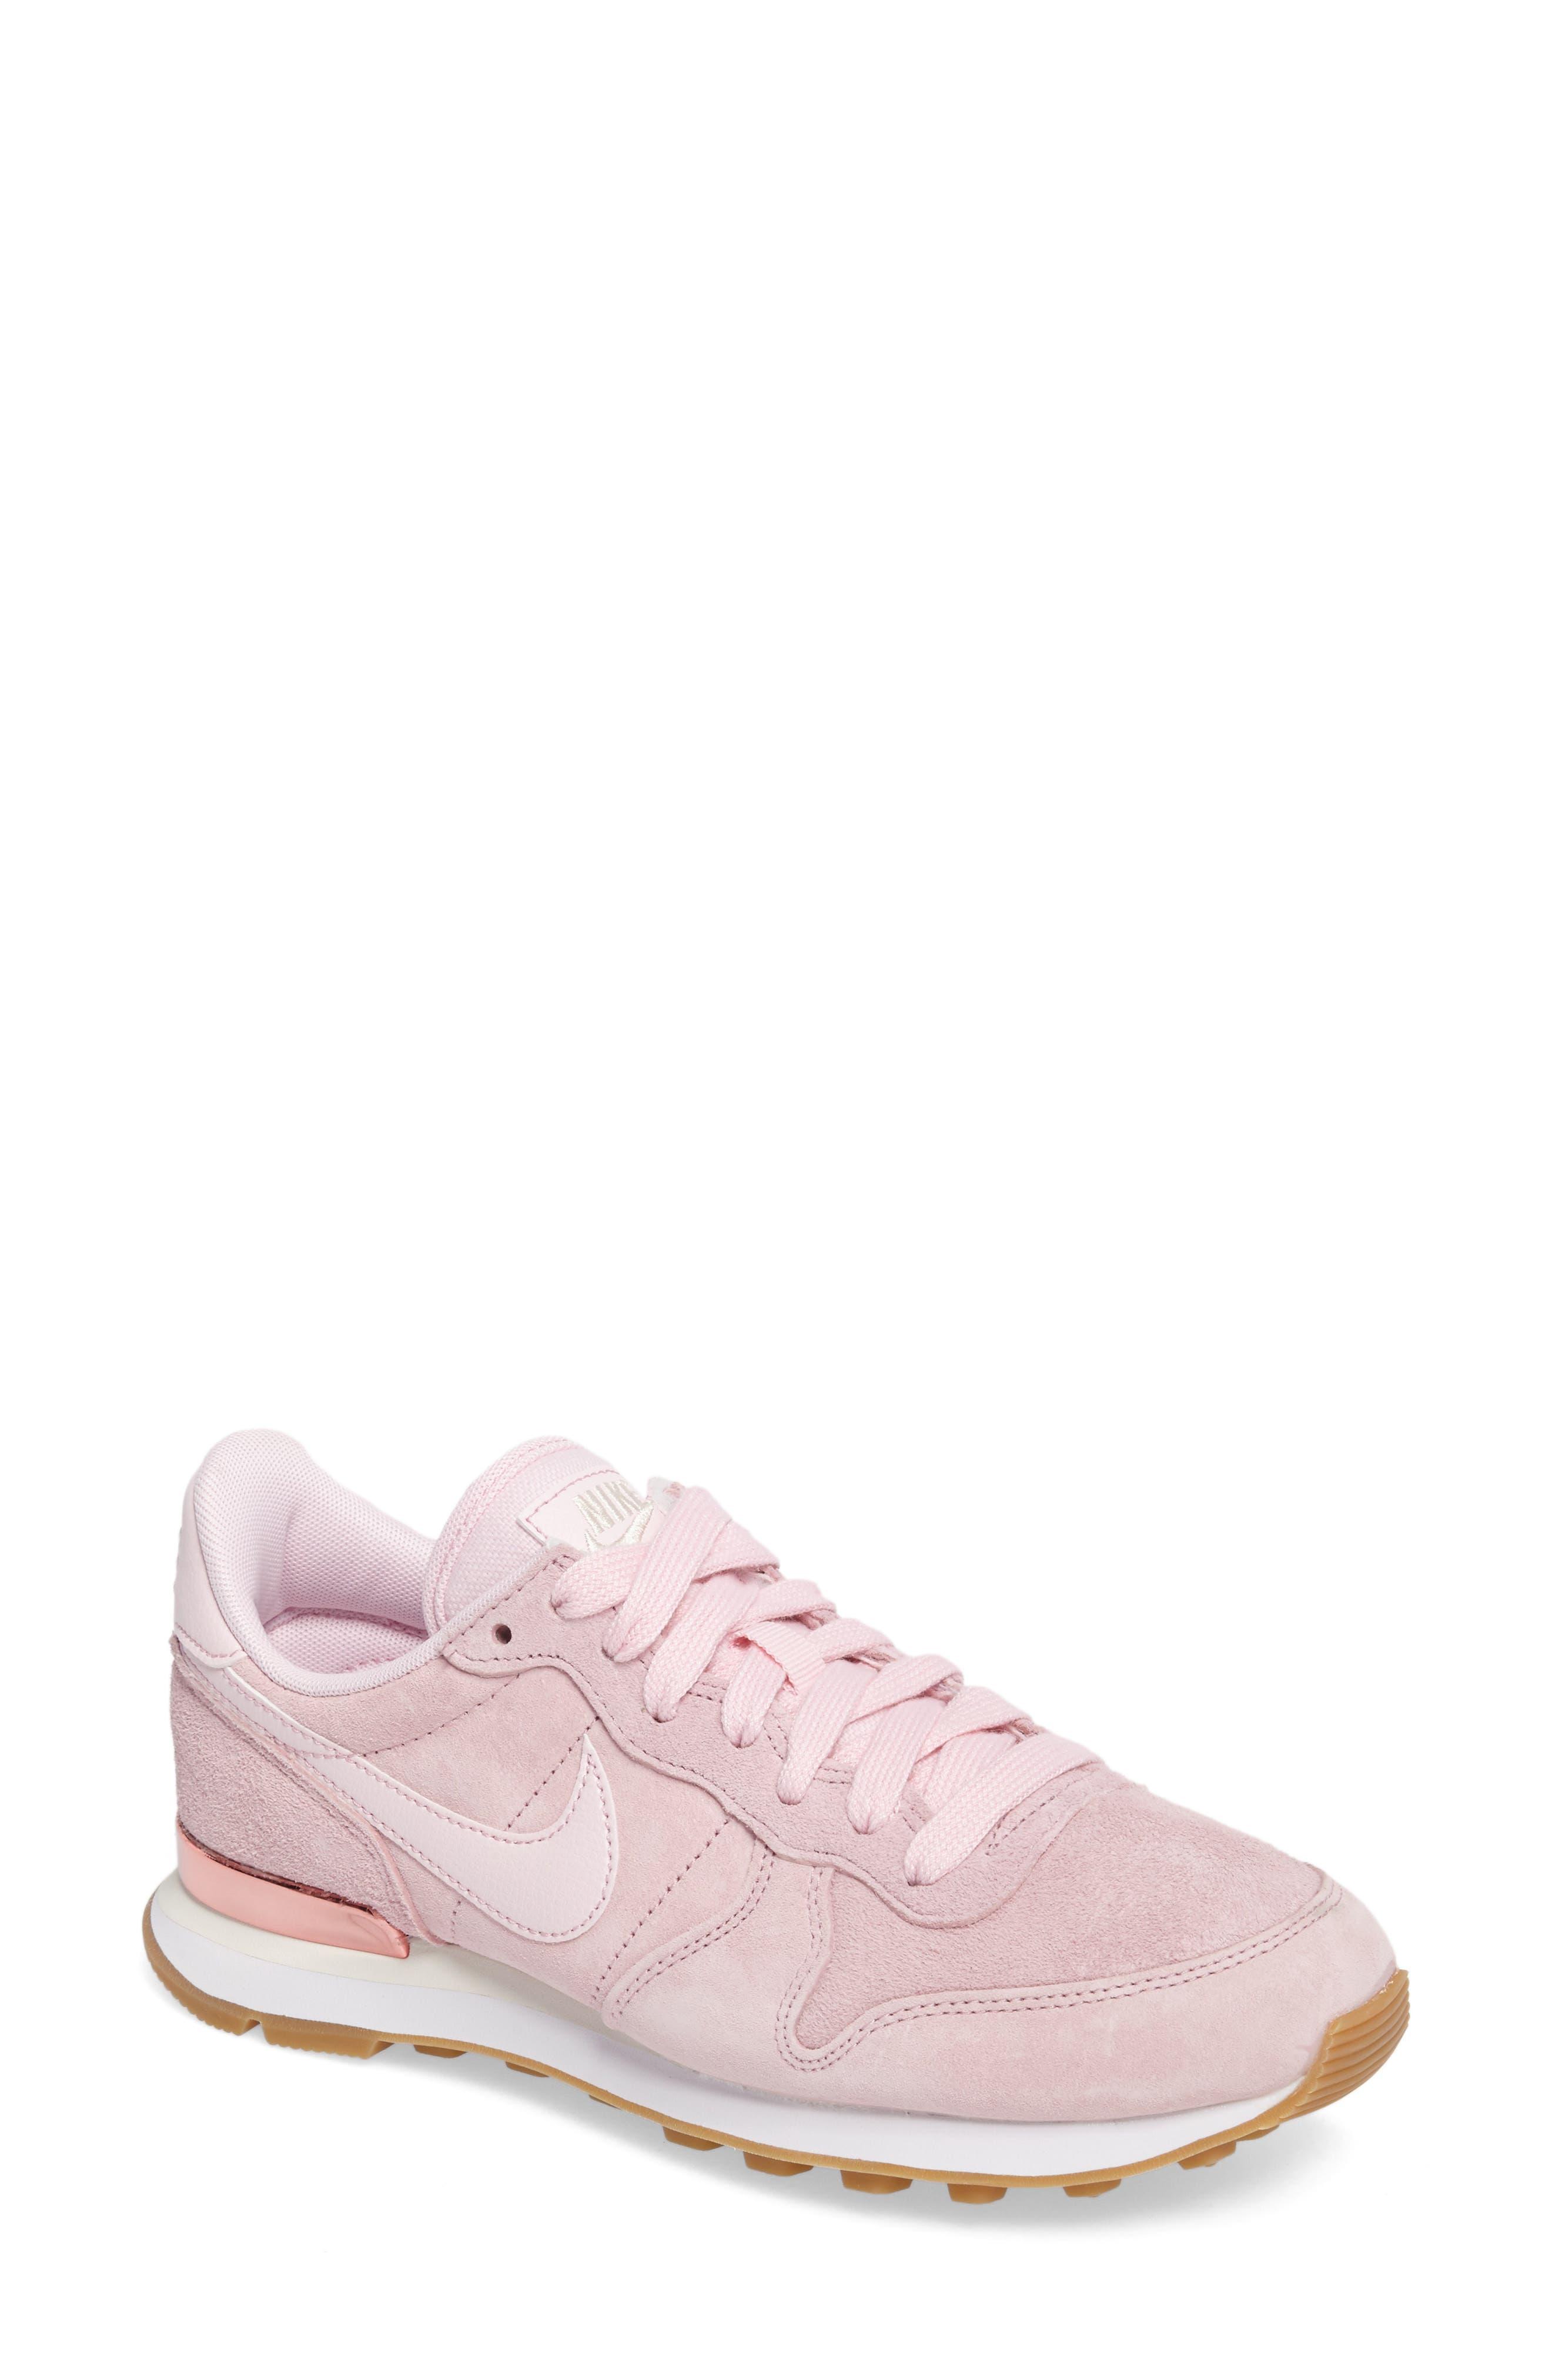 Internationalist SD Sneaker,                             Main thumbnail 1, color,                             Prism Pink/ Prism Pink